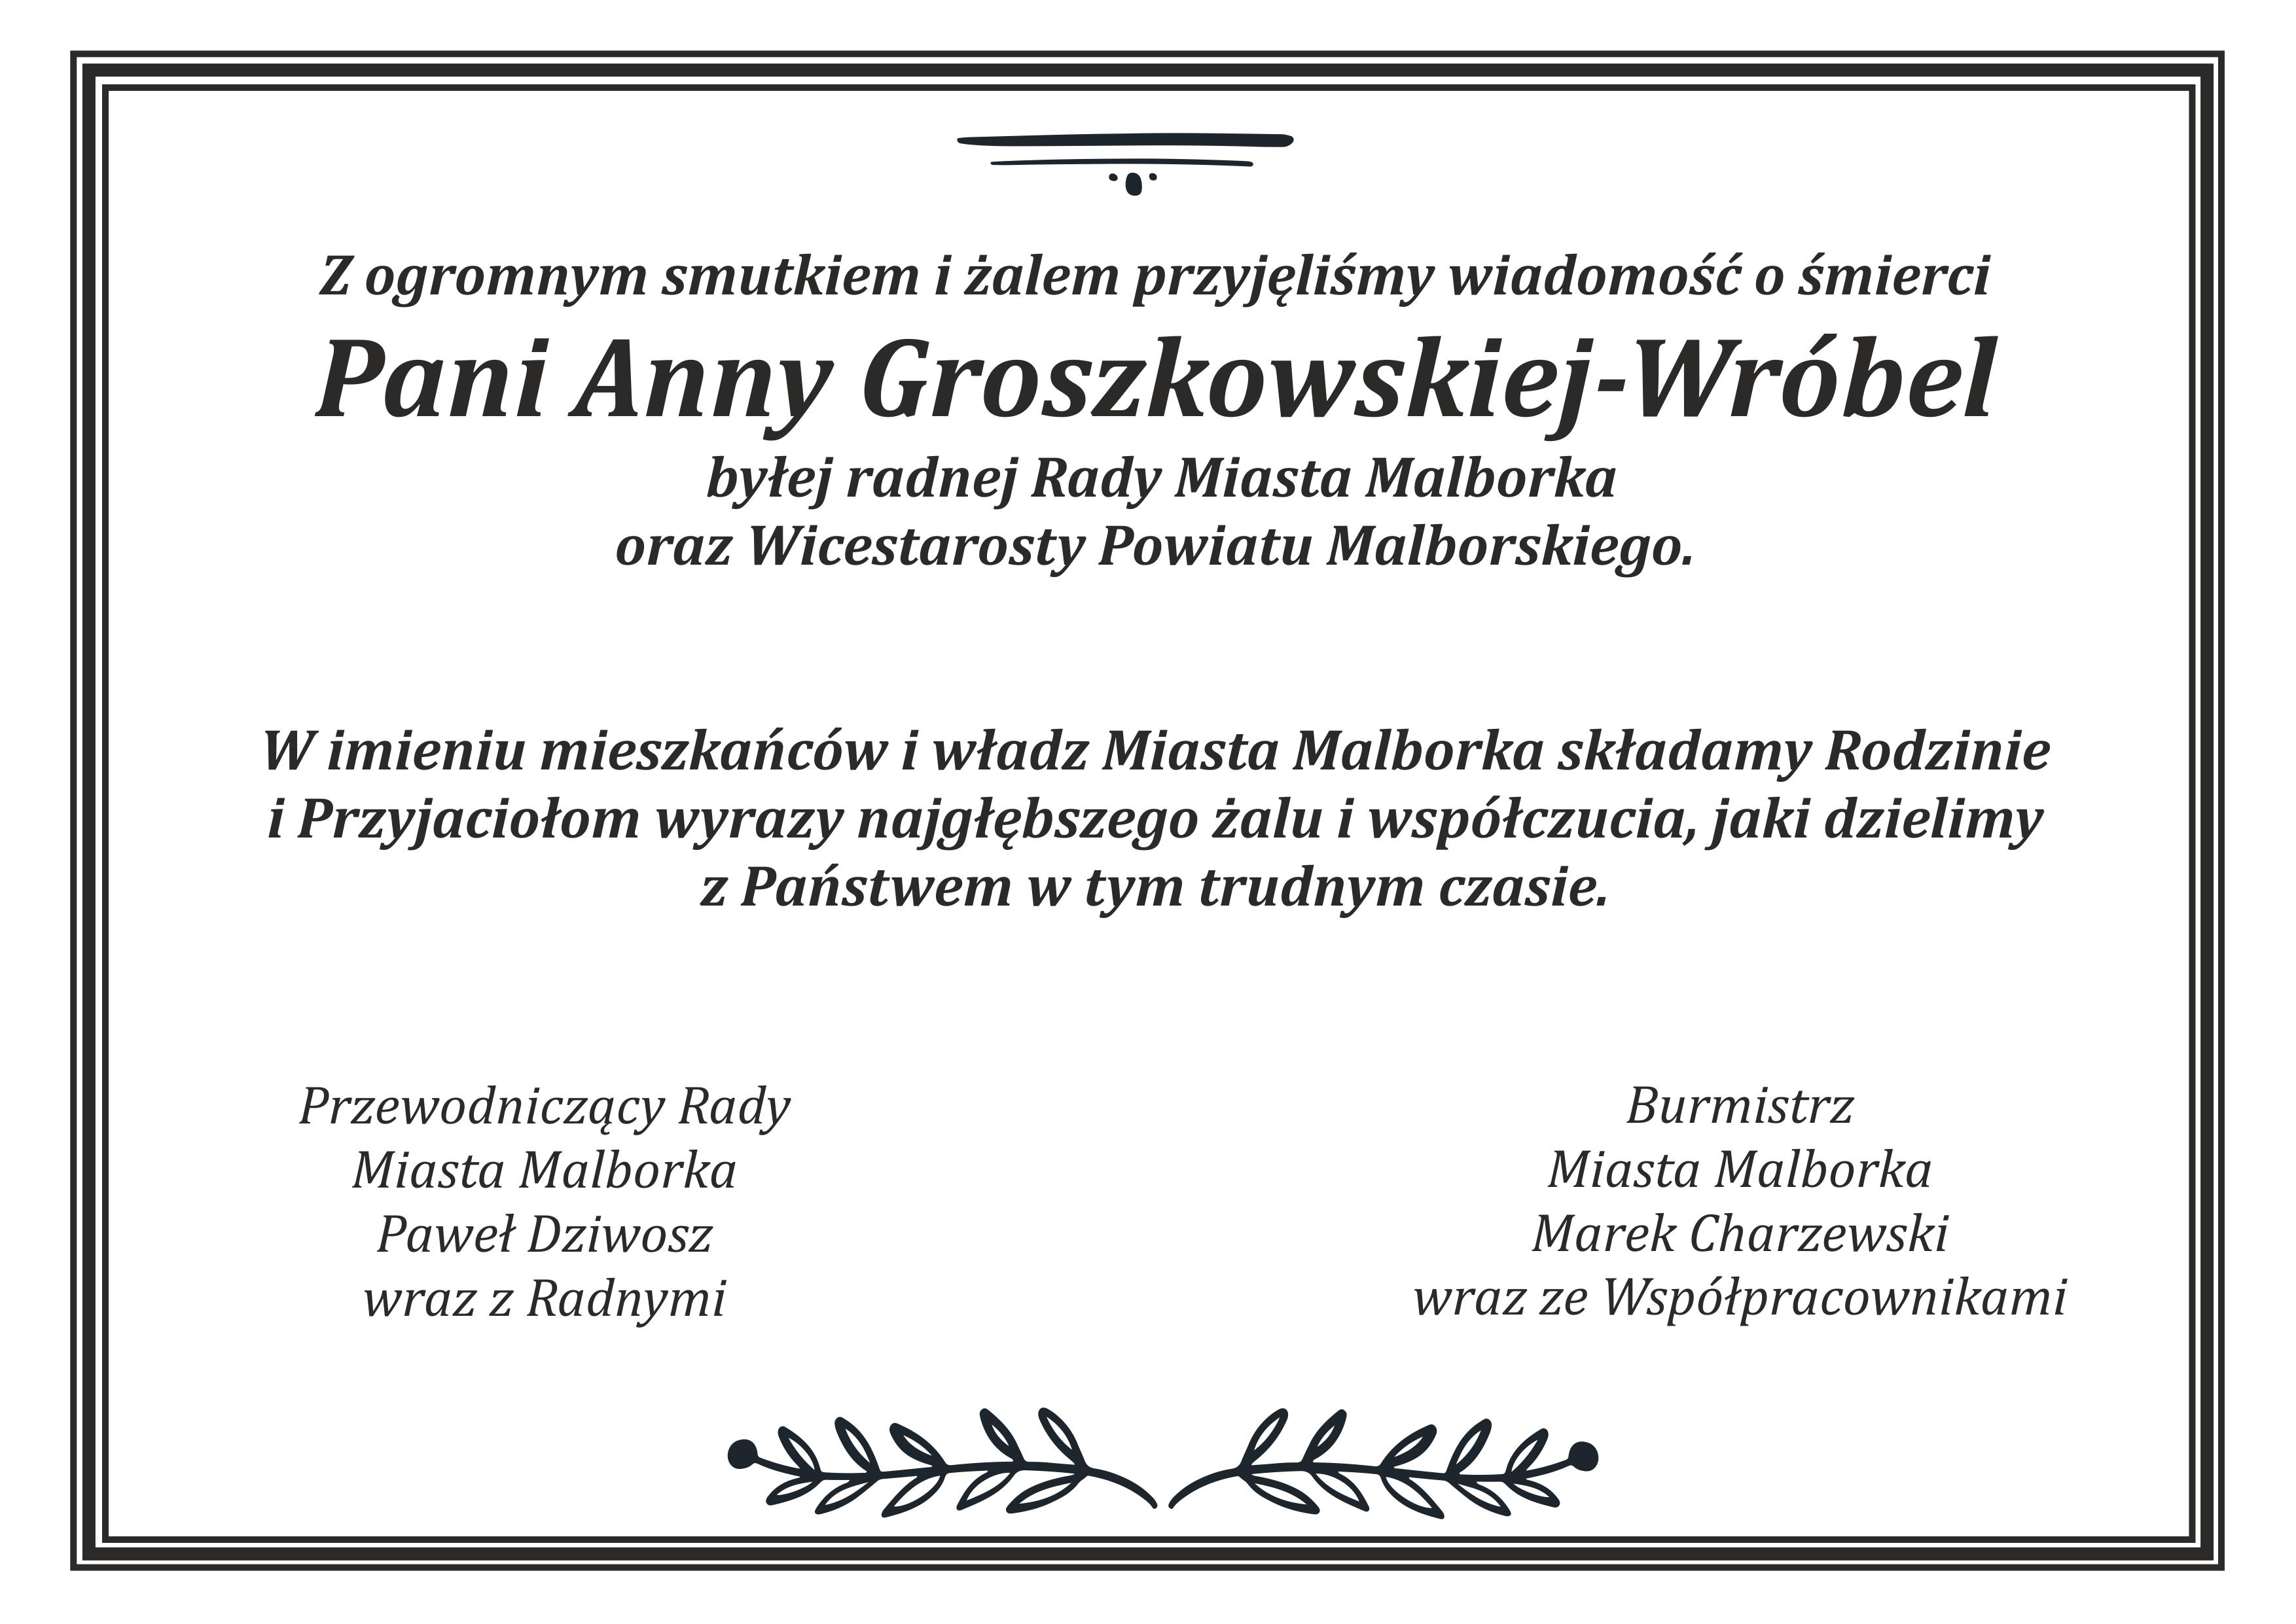 http://m.82-200.pl/2021/03/orig/kondolencjeannagroszkowska-6863.png